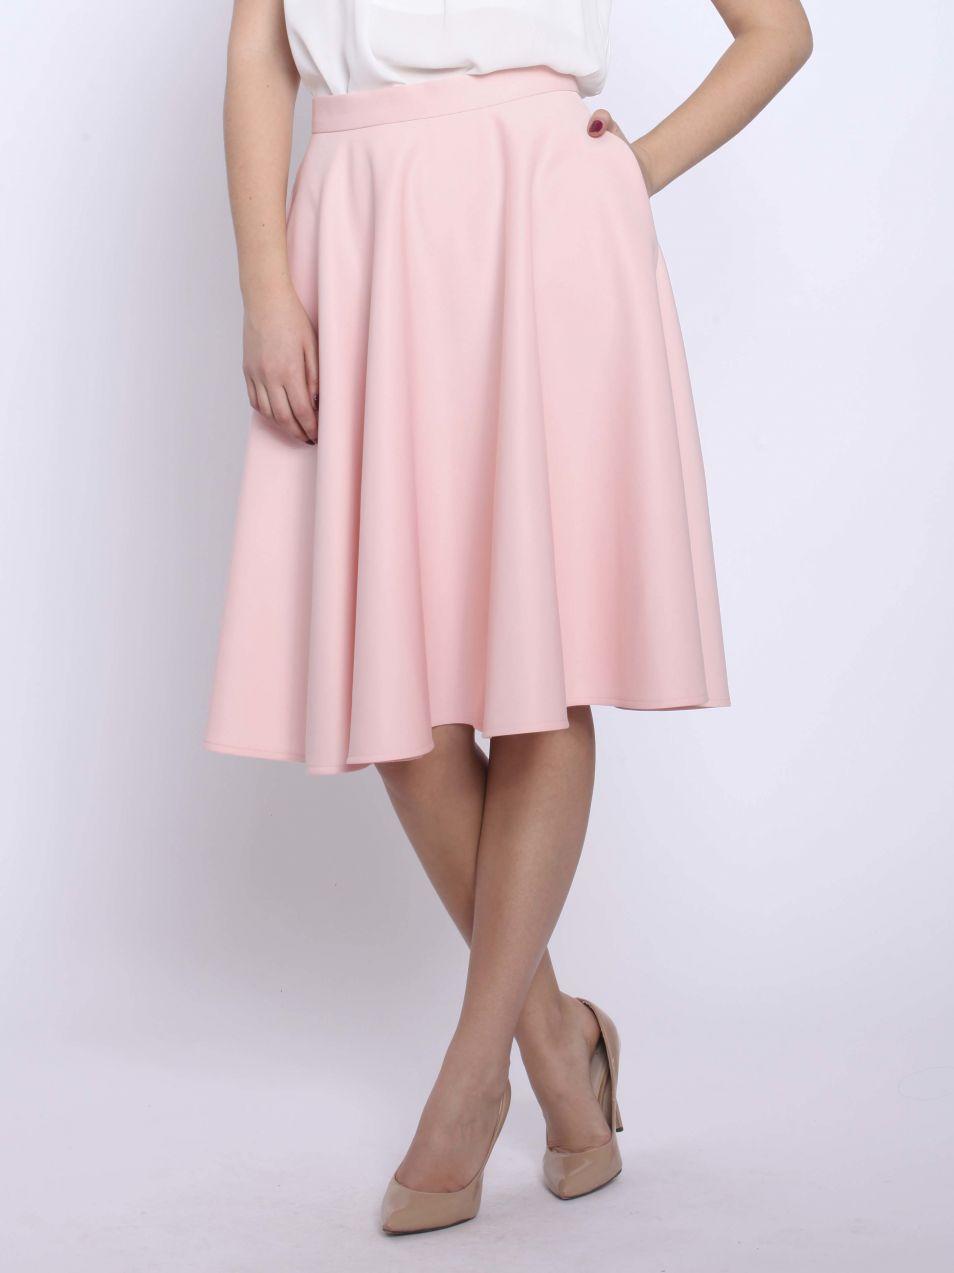 833f21cf8742 Vera Ravenna Dámska sukňa VRV 10401 shell pink značky Vera Ravenna ...